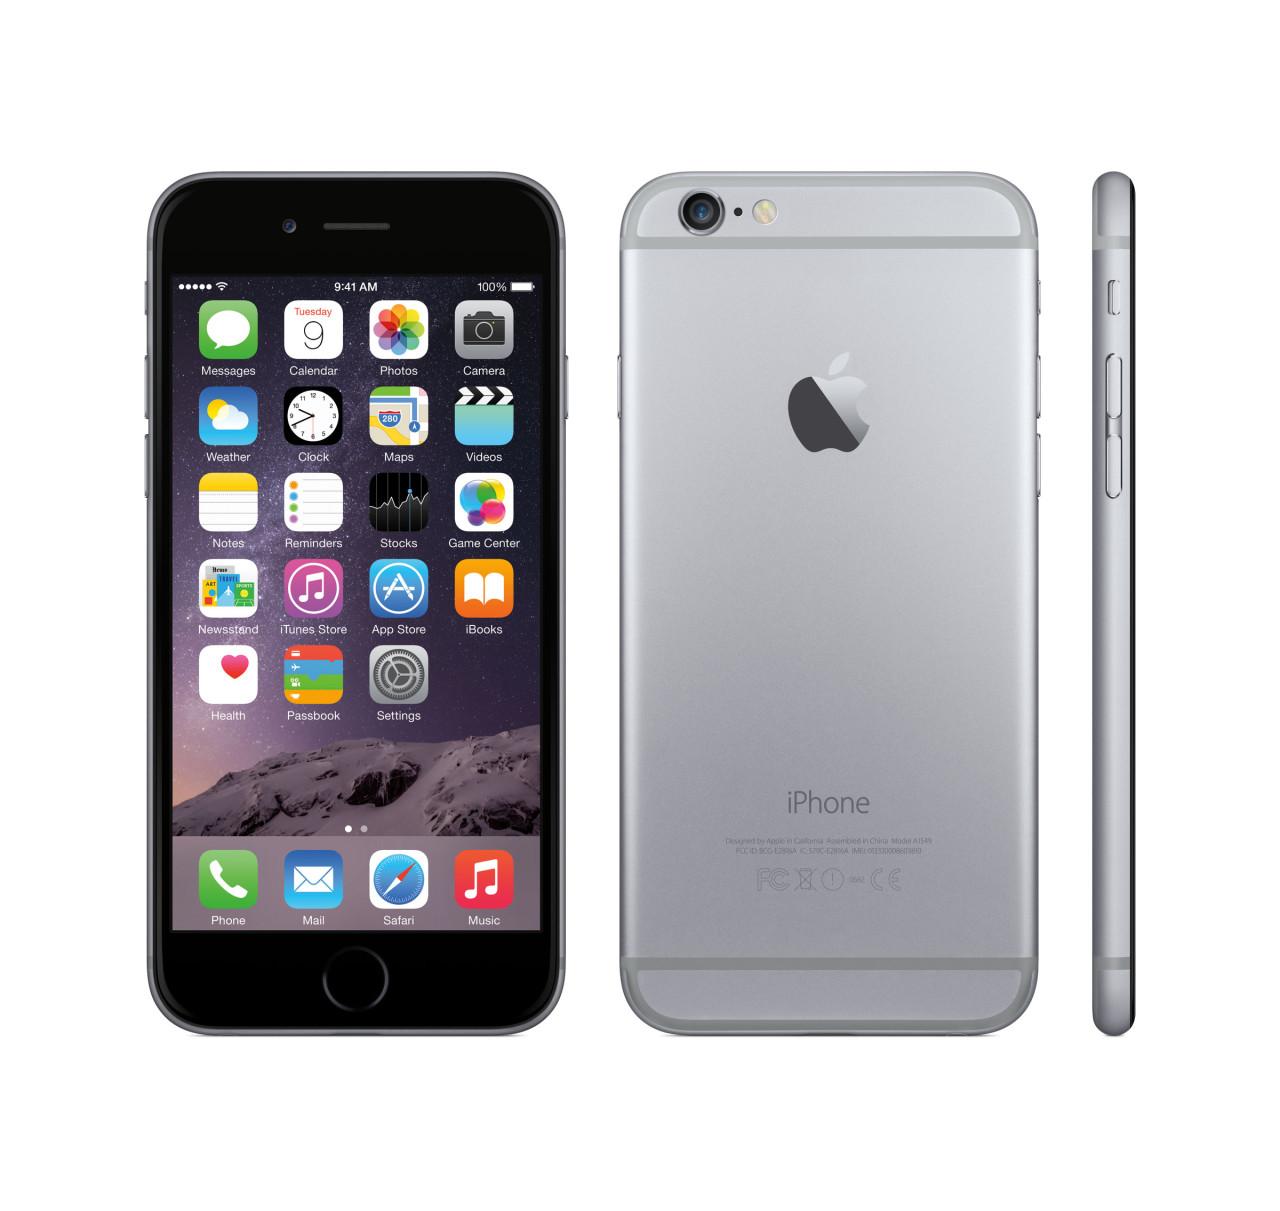 iPhone-6-press-image-1280x1211